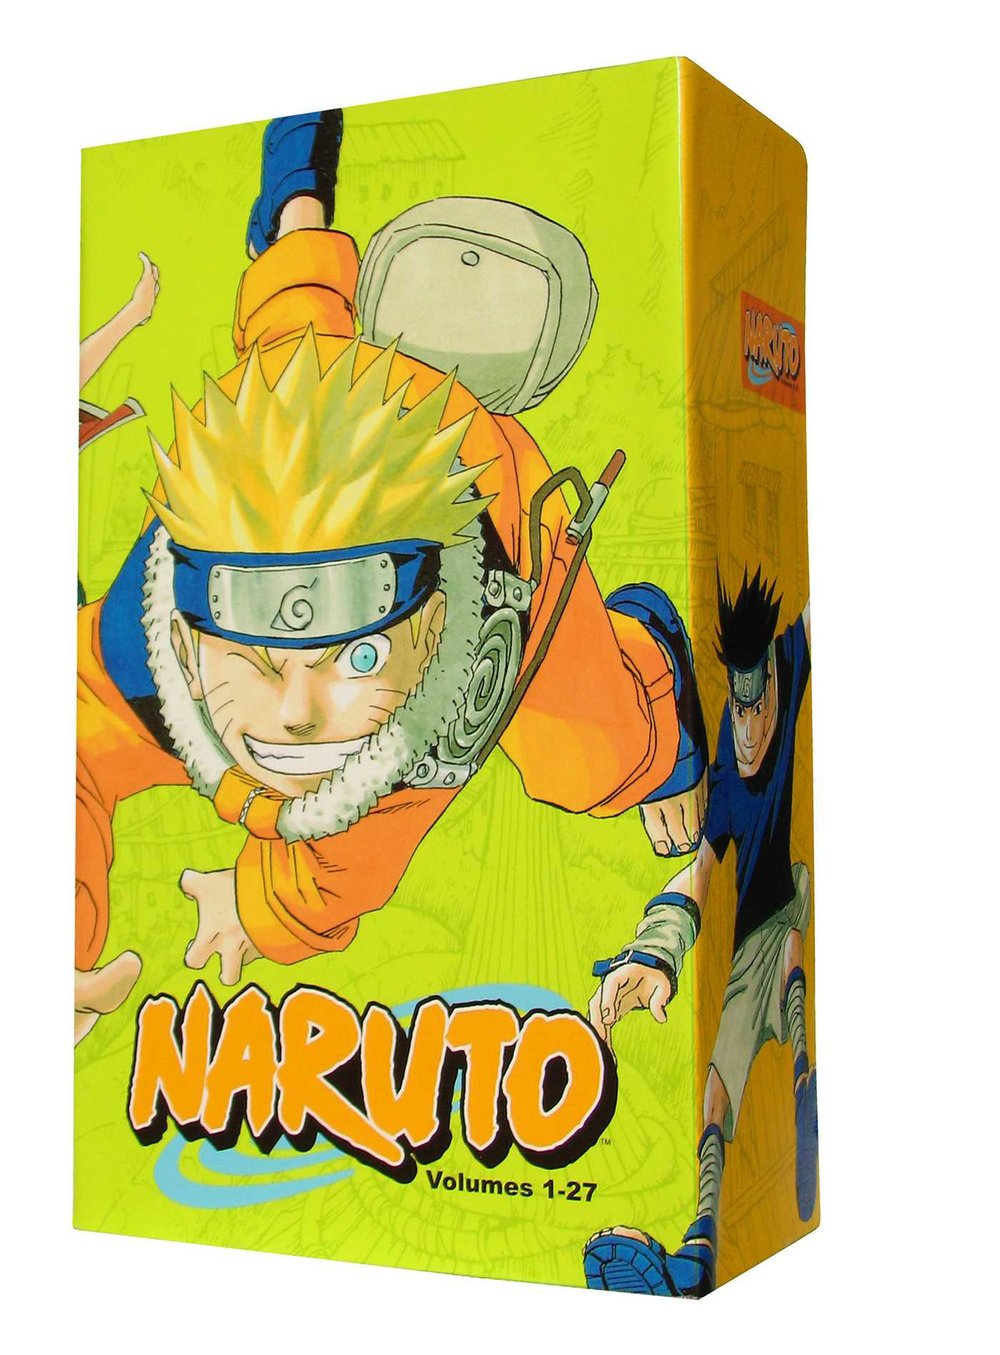 naruto-2008-box-set-vol-s-1-27-9781421525822_hr.jpg